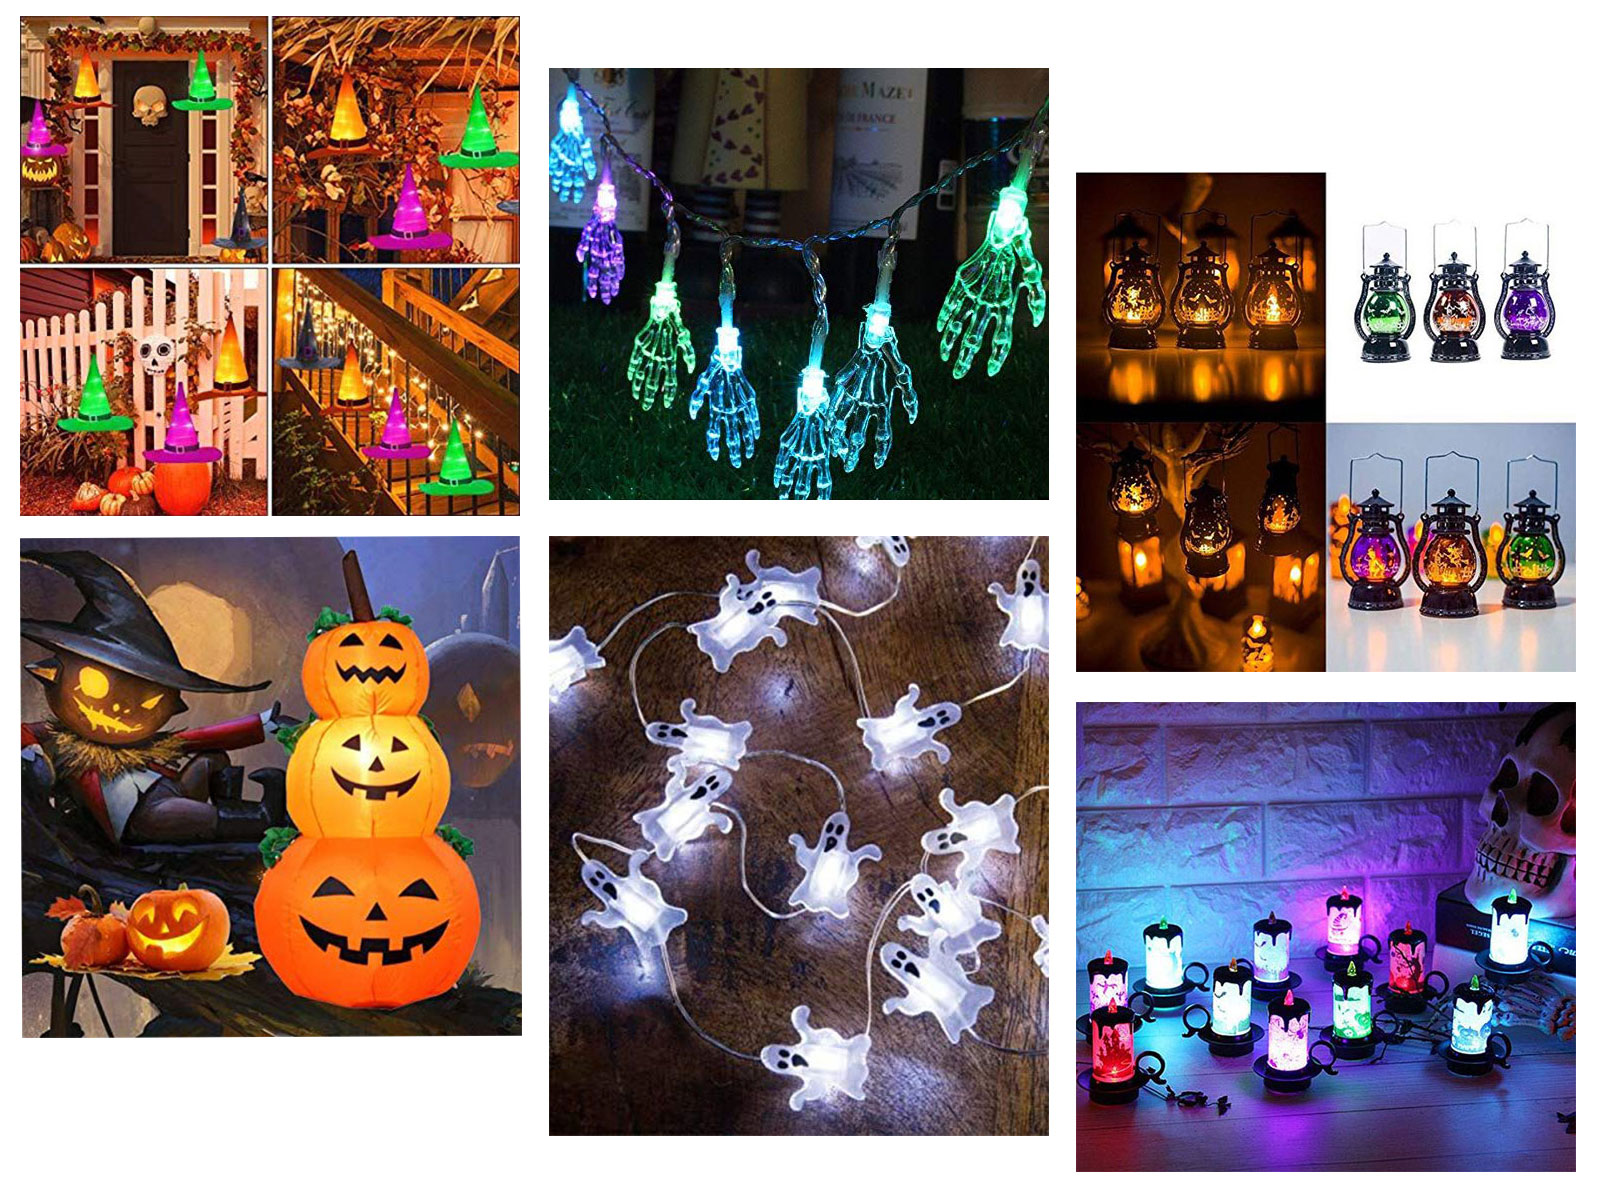 15-Cool-Amazing-Halloween-Light-Decoration-Ideas-2019-F